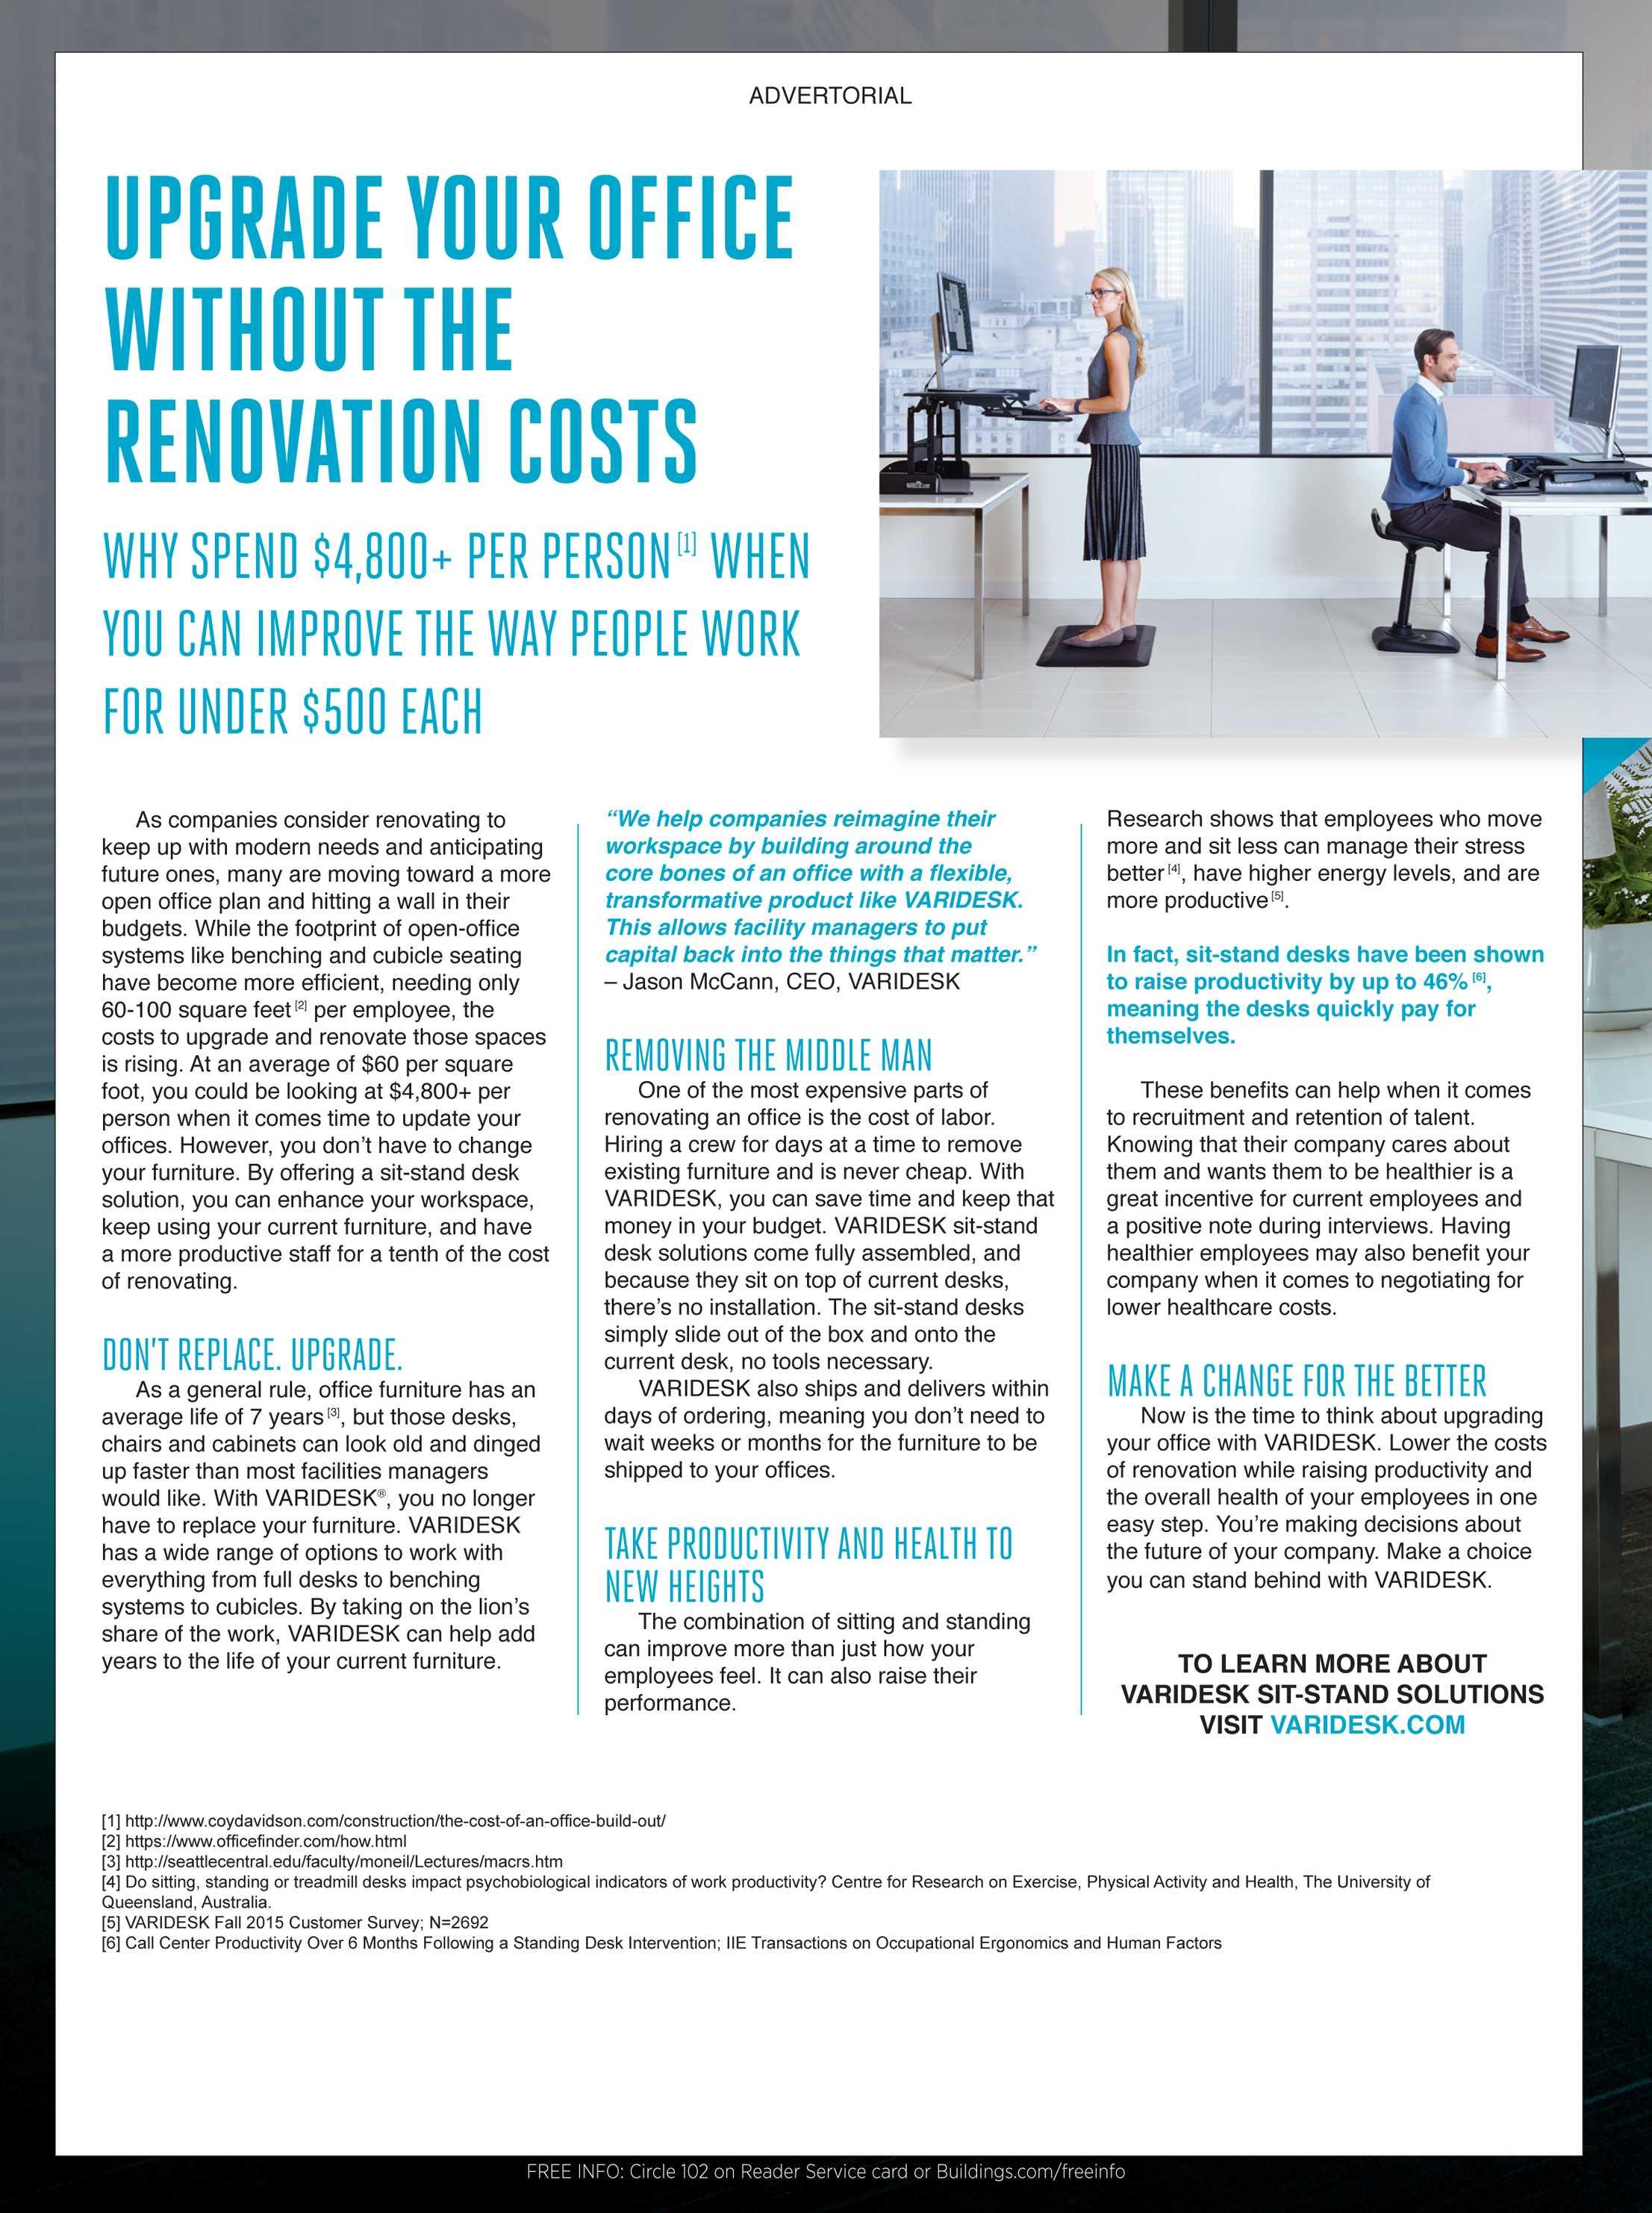 Buildings Magazine - January 2017 - page 4